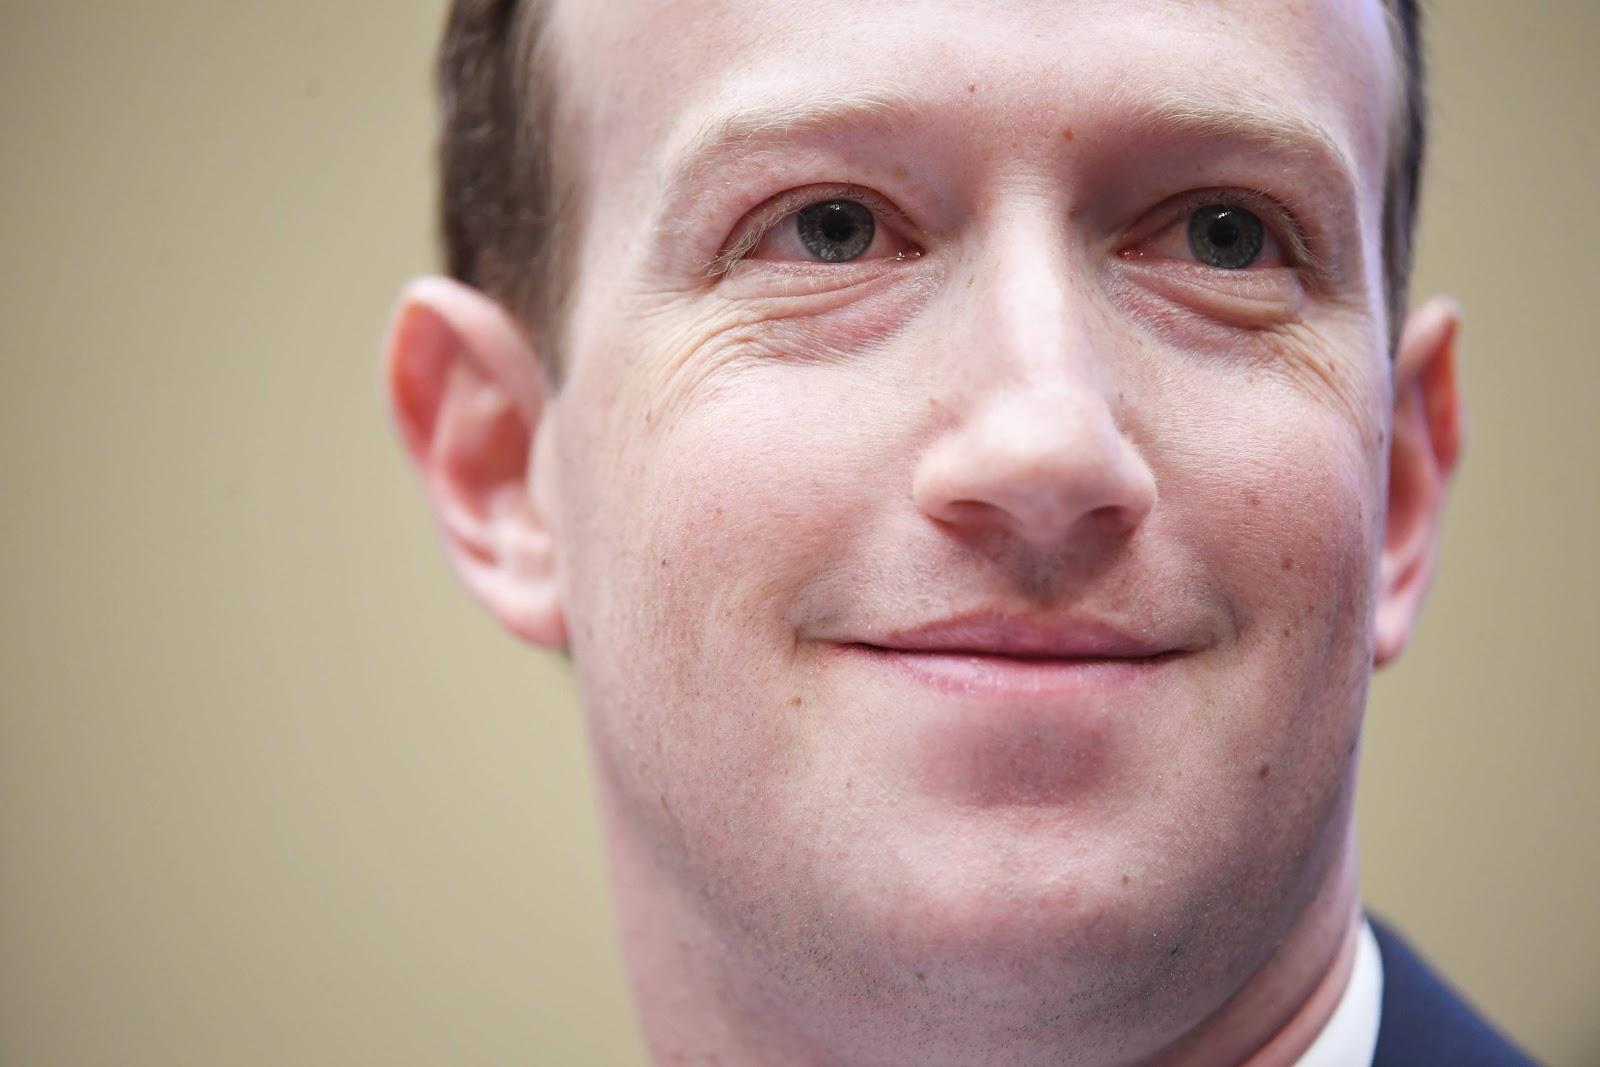 Mark Zuckerberg, The white man censoring everyone in 2020